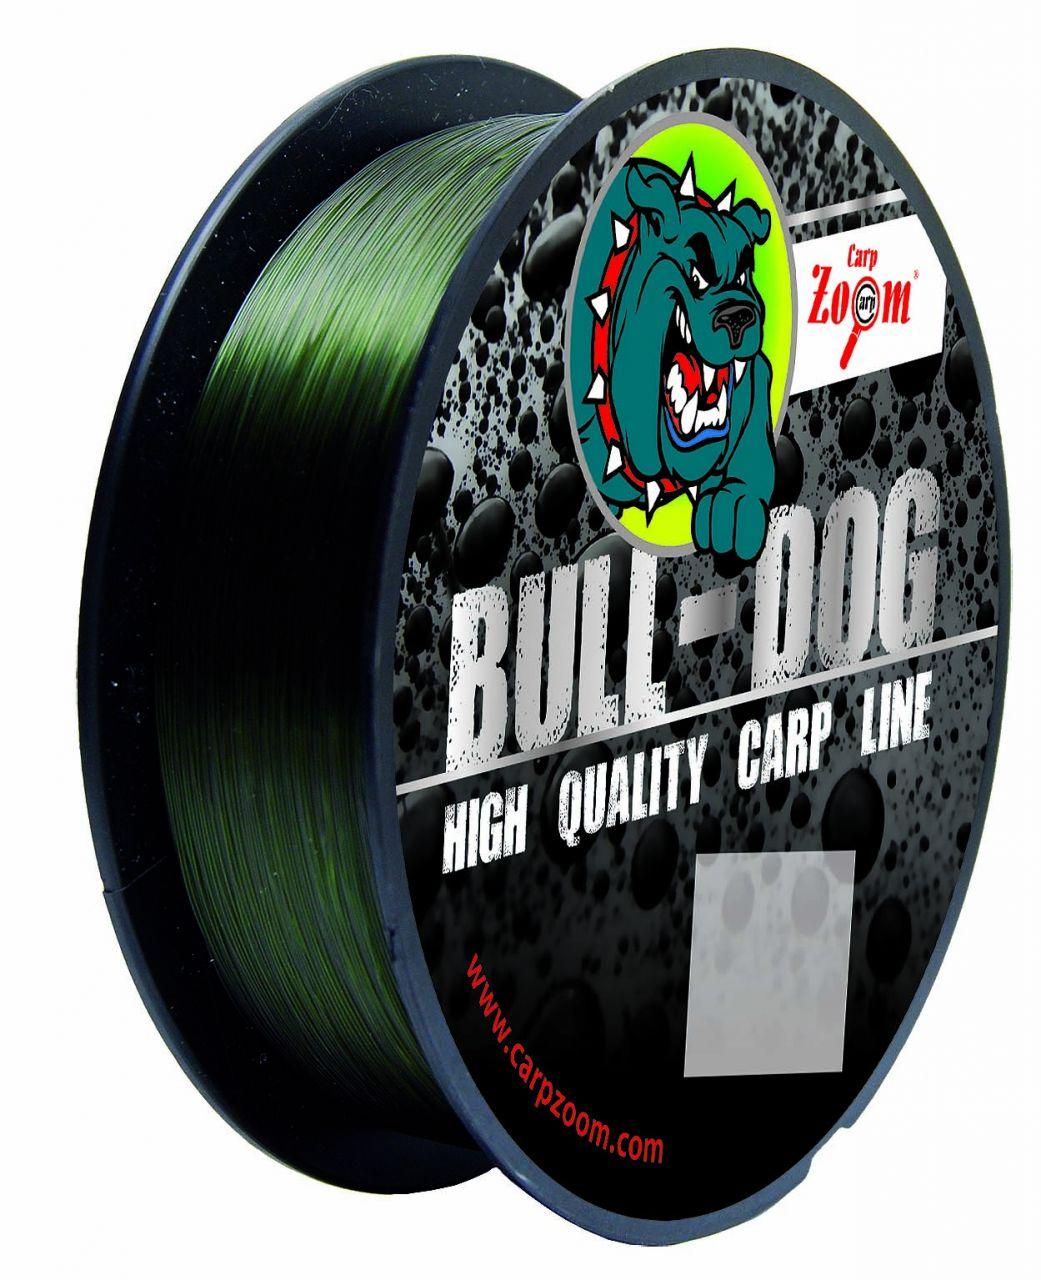 Carp Zoom Bull-Dog Carp Line 1000m